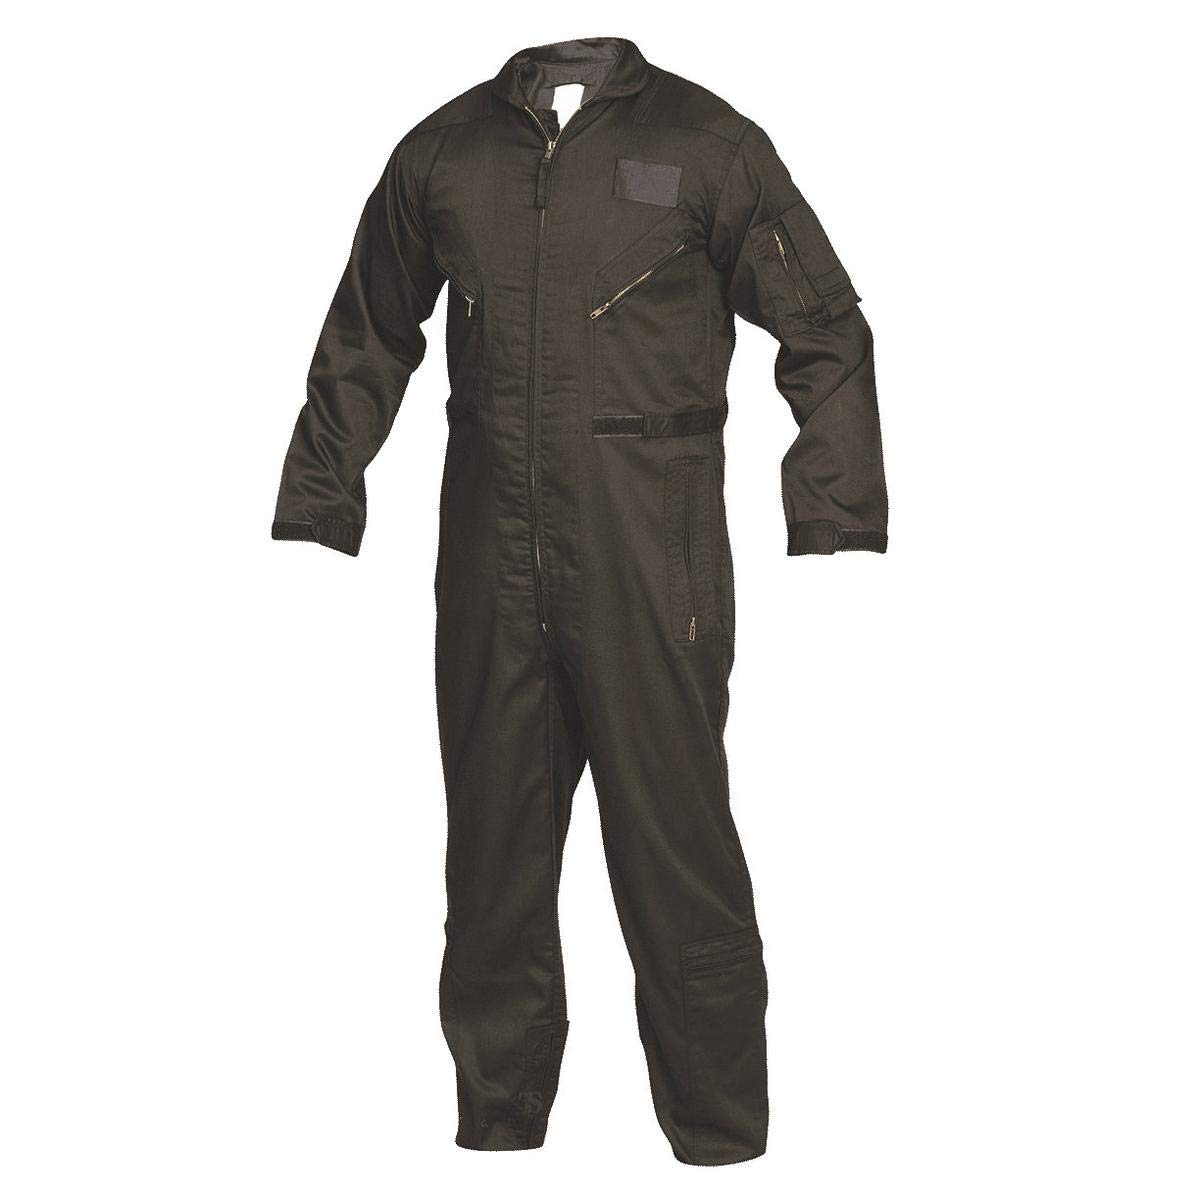 Tru 27-p Nvy Tru-Spec Mens Flight Suit Ll One-Piece